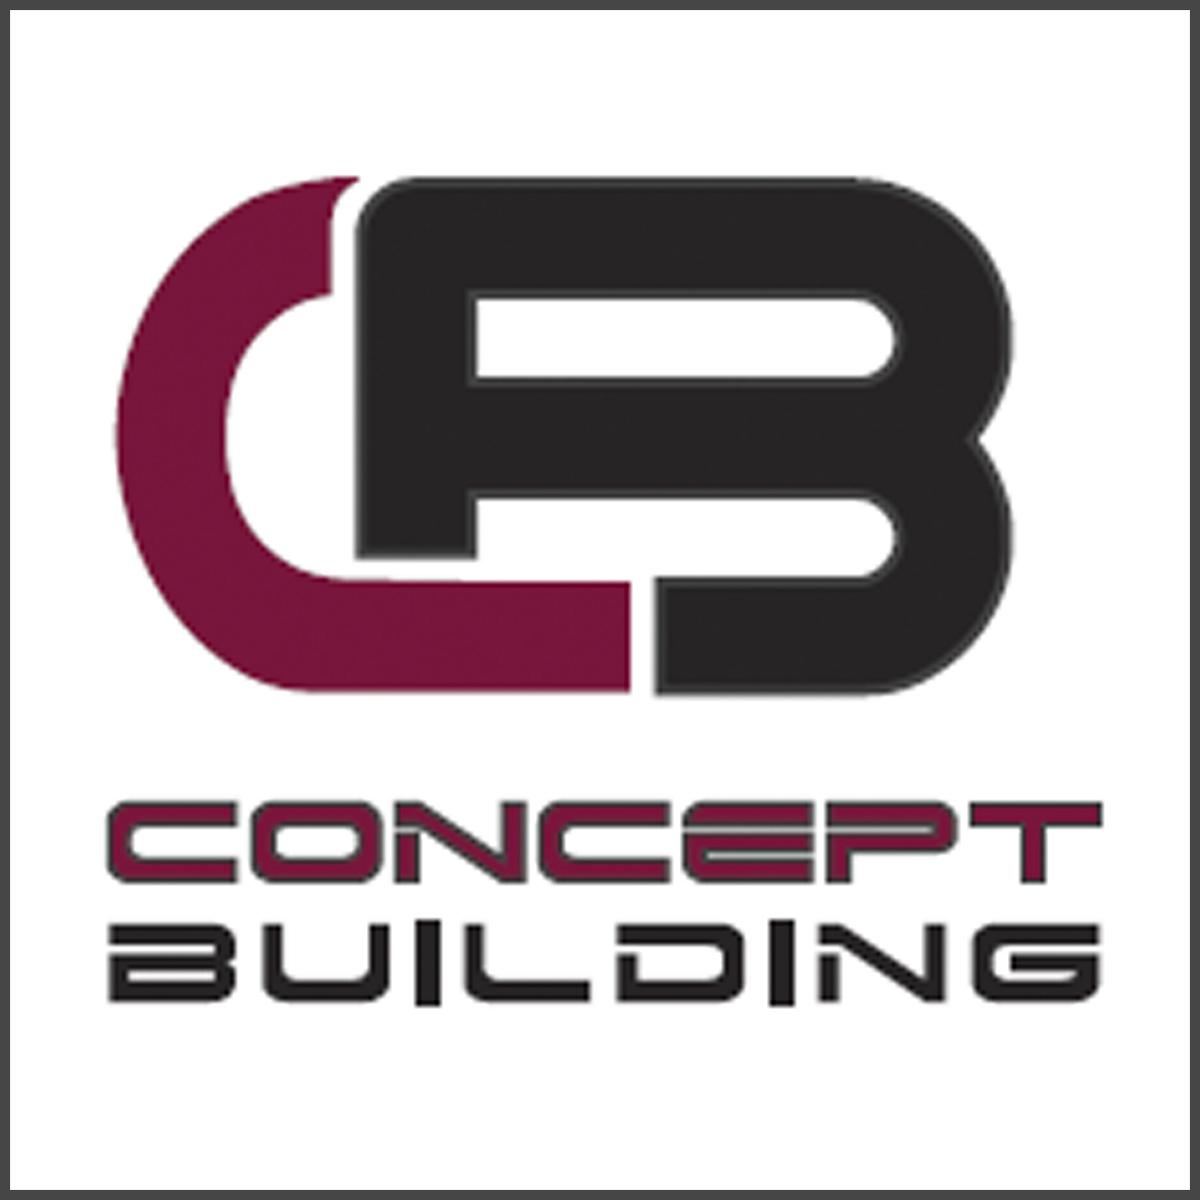 Logo-Concept-Building Mantenimiento a Empresas